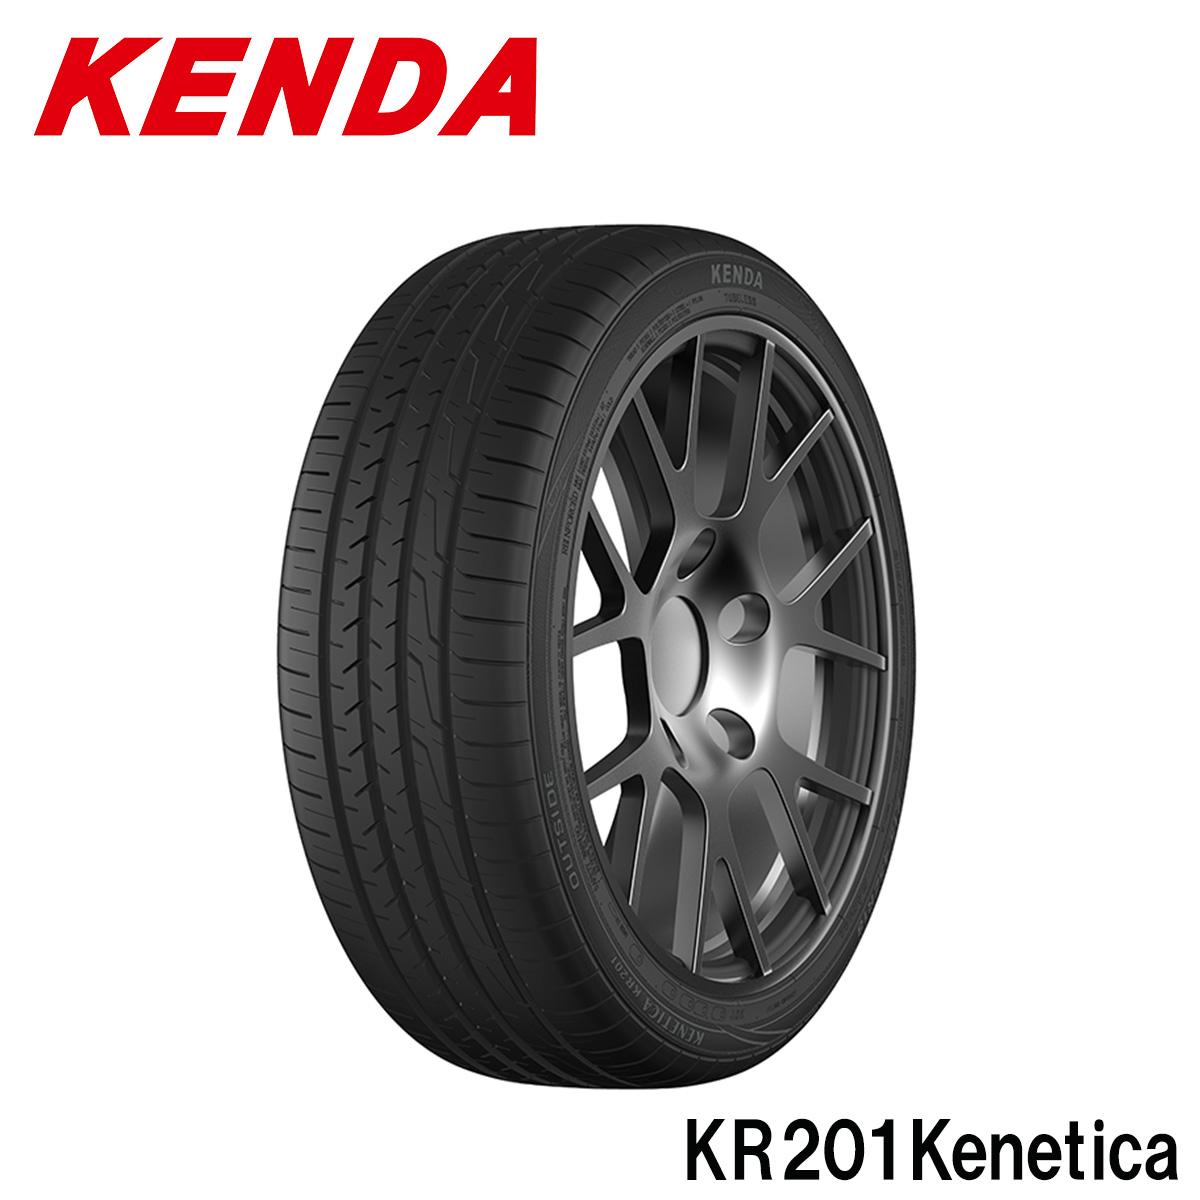 KENDA ケンダ ミニバン タイア 4本 セット 18インチ 215/55R18 KR201 Kenetica